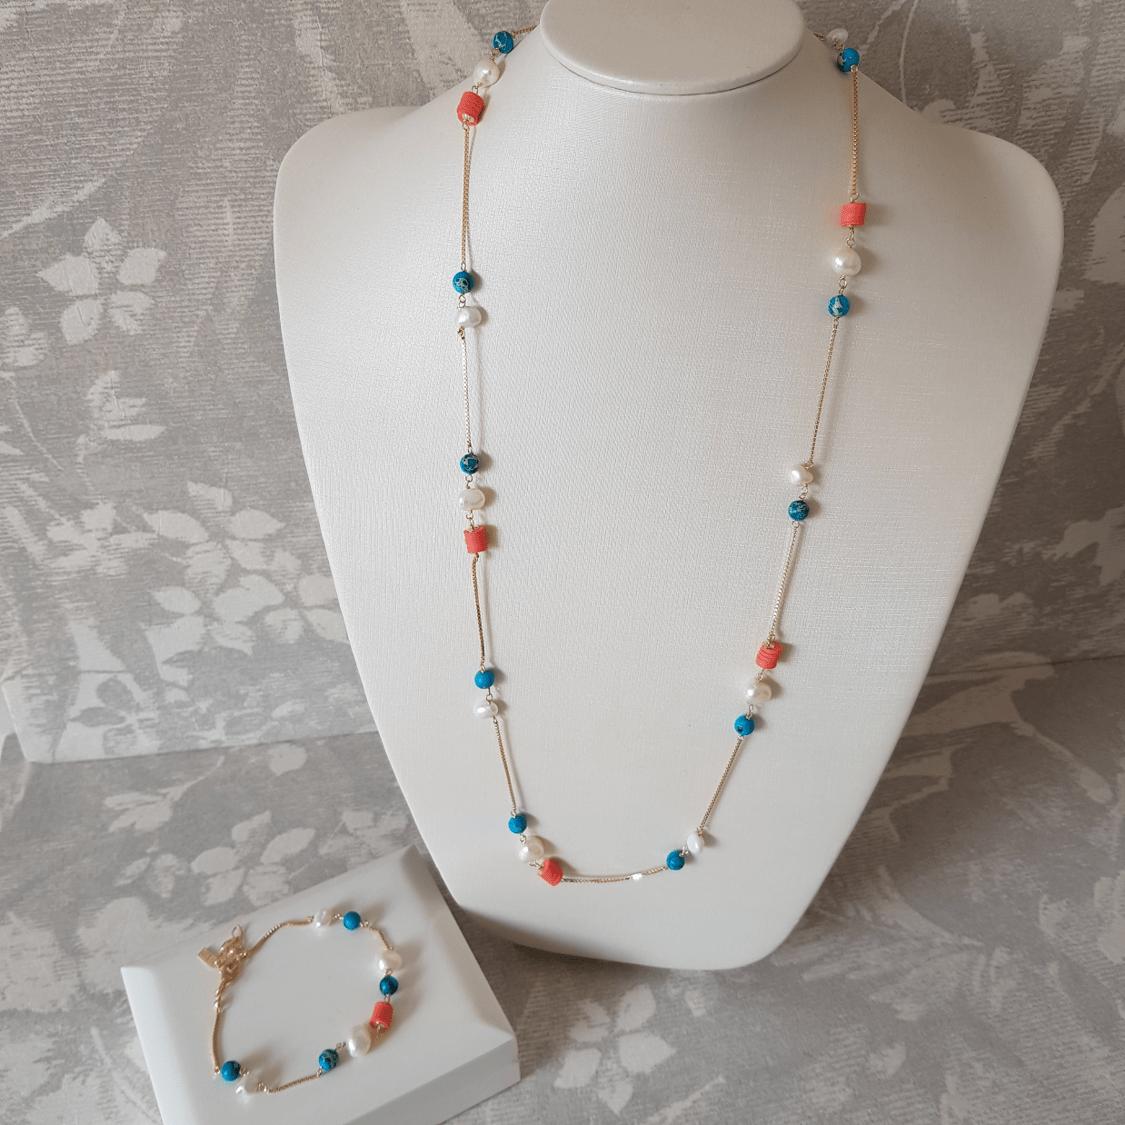 Conjunto colar e pulseira - coral e turquesa